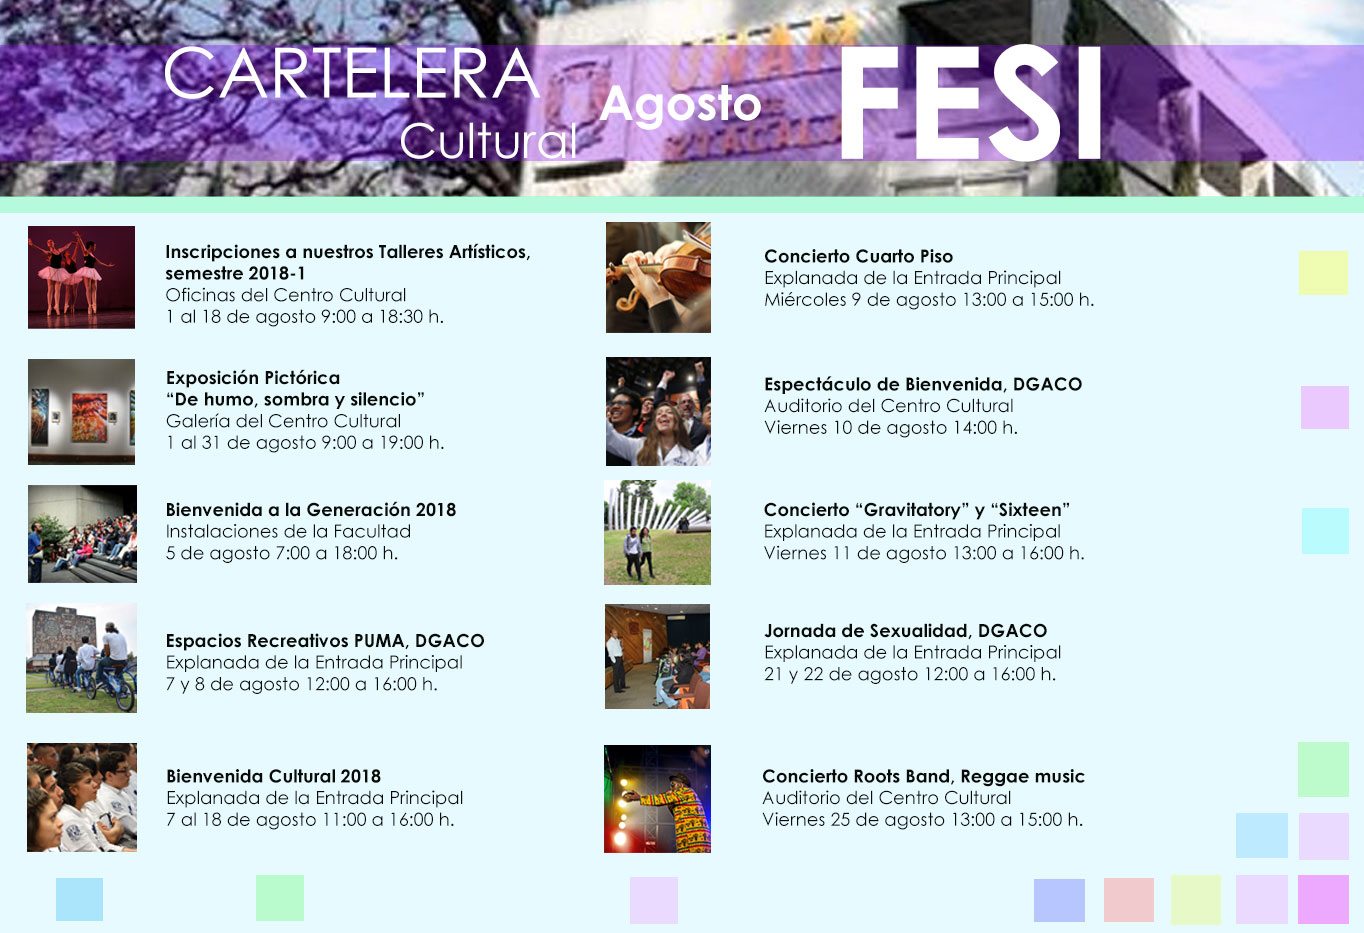 Cartelera-CulturalUntitled-1